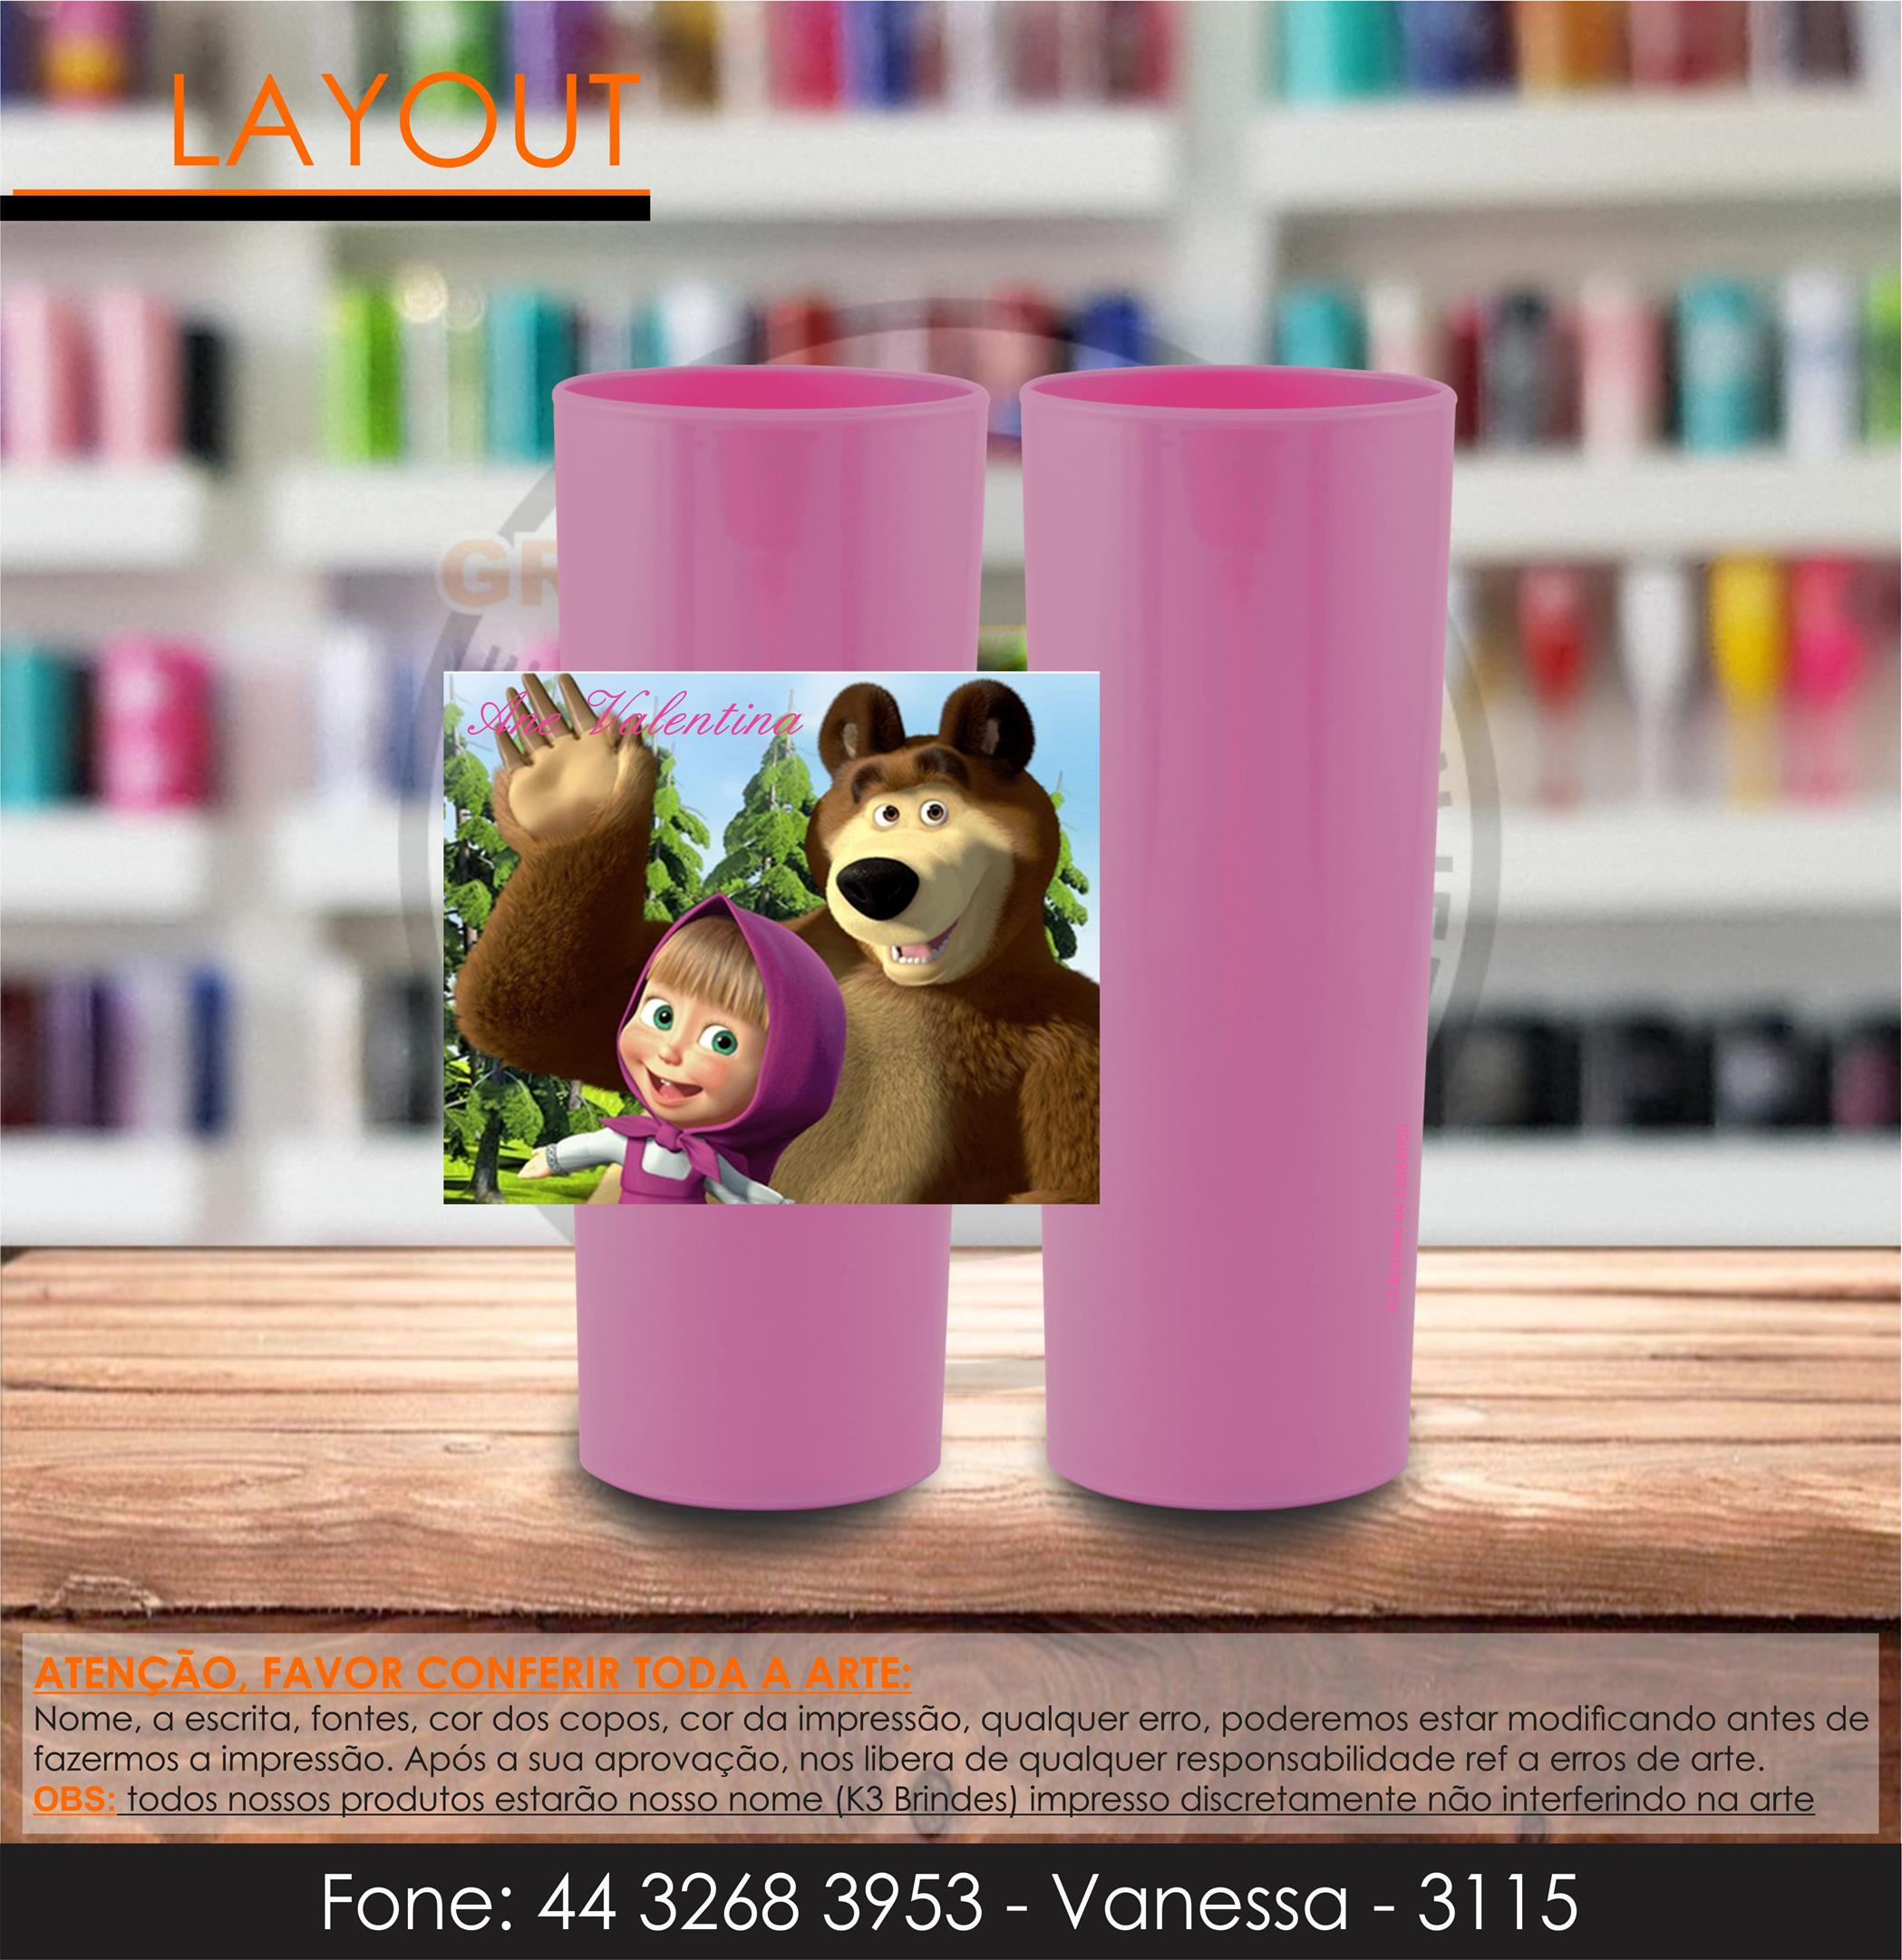 3115 - long drink rosa perolizado - masha e urso - infantil